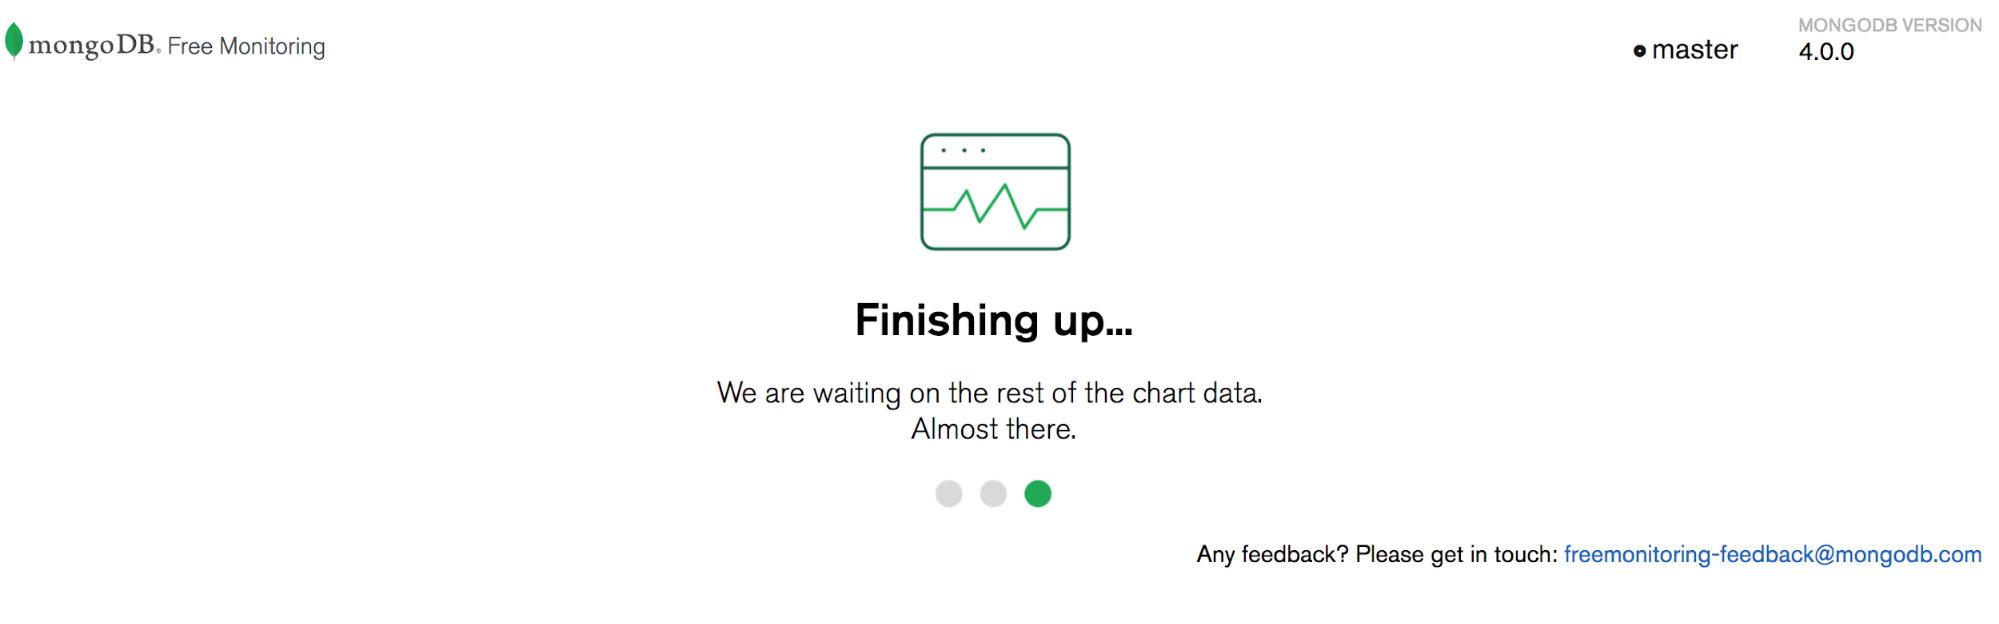 MongoDB Free Monitoring first use